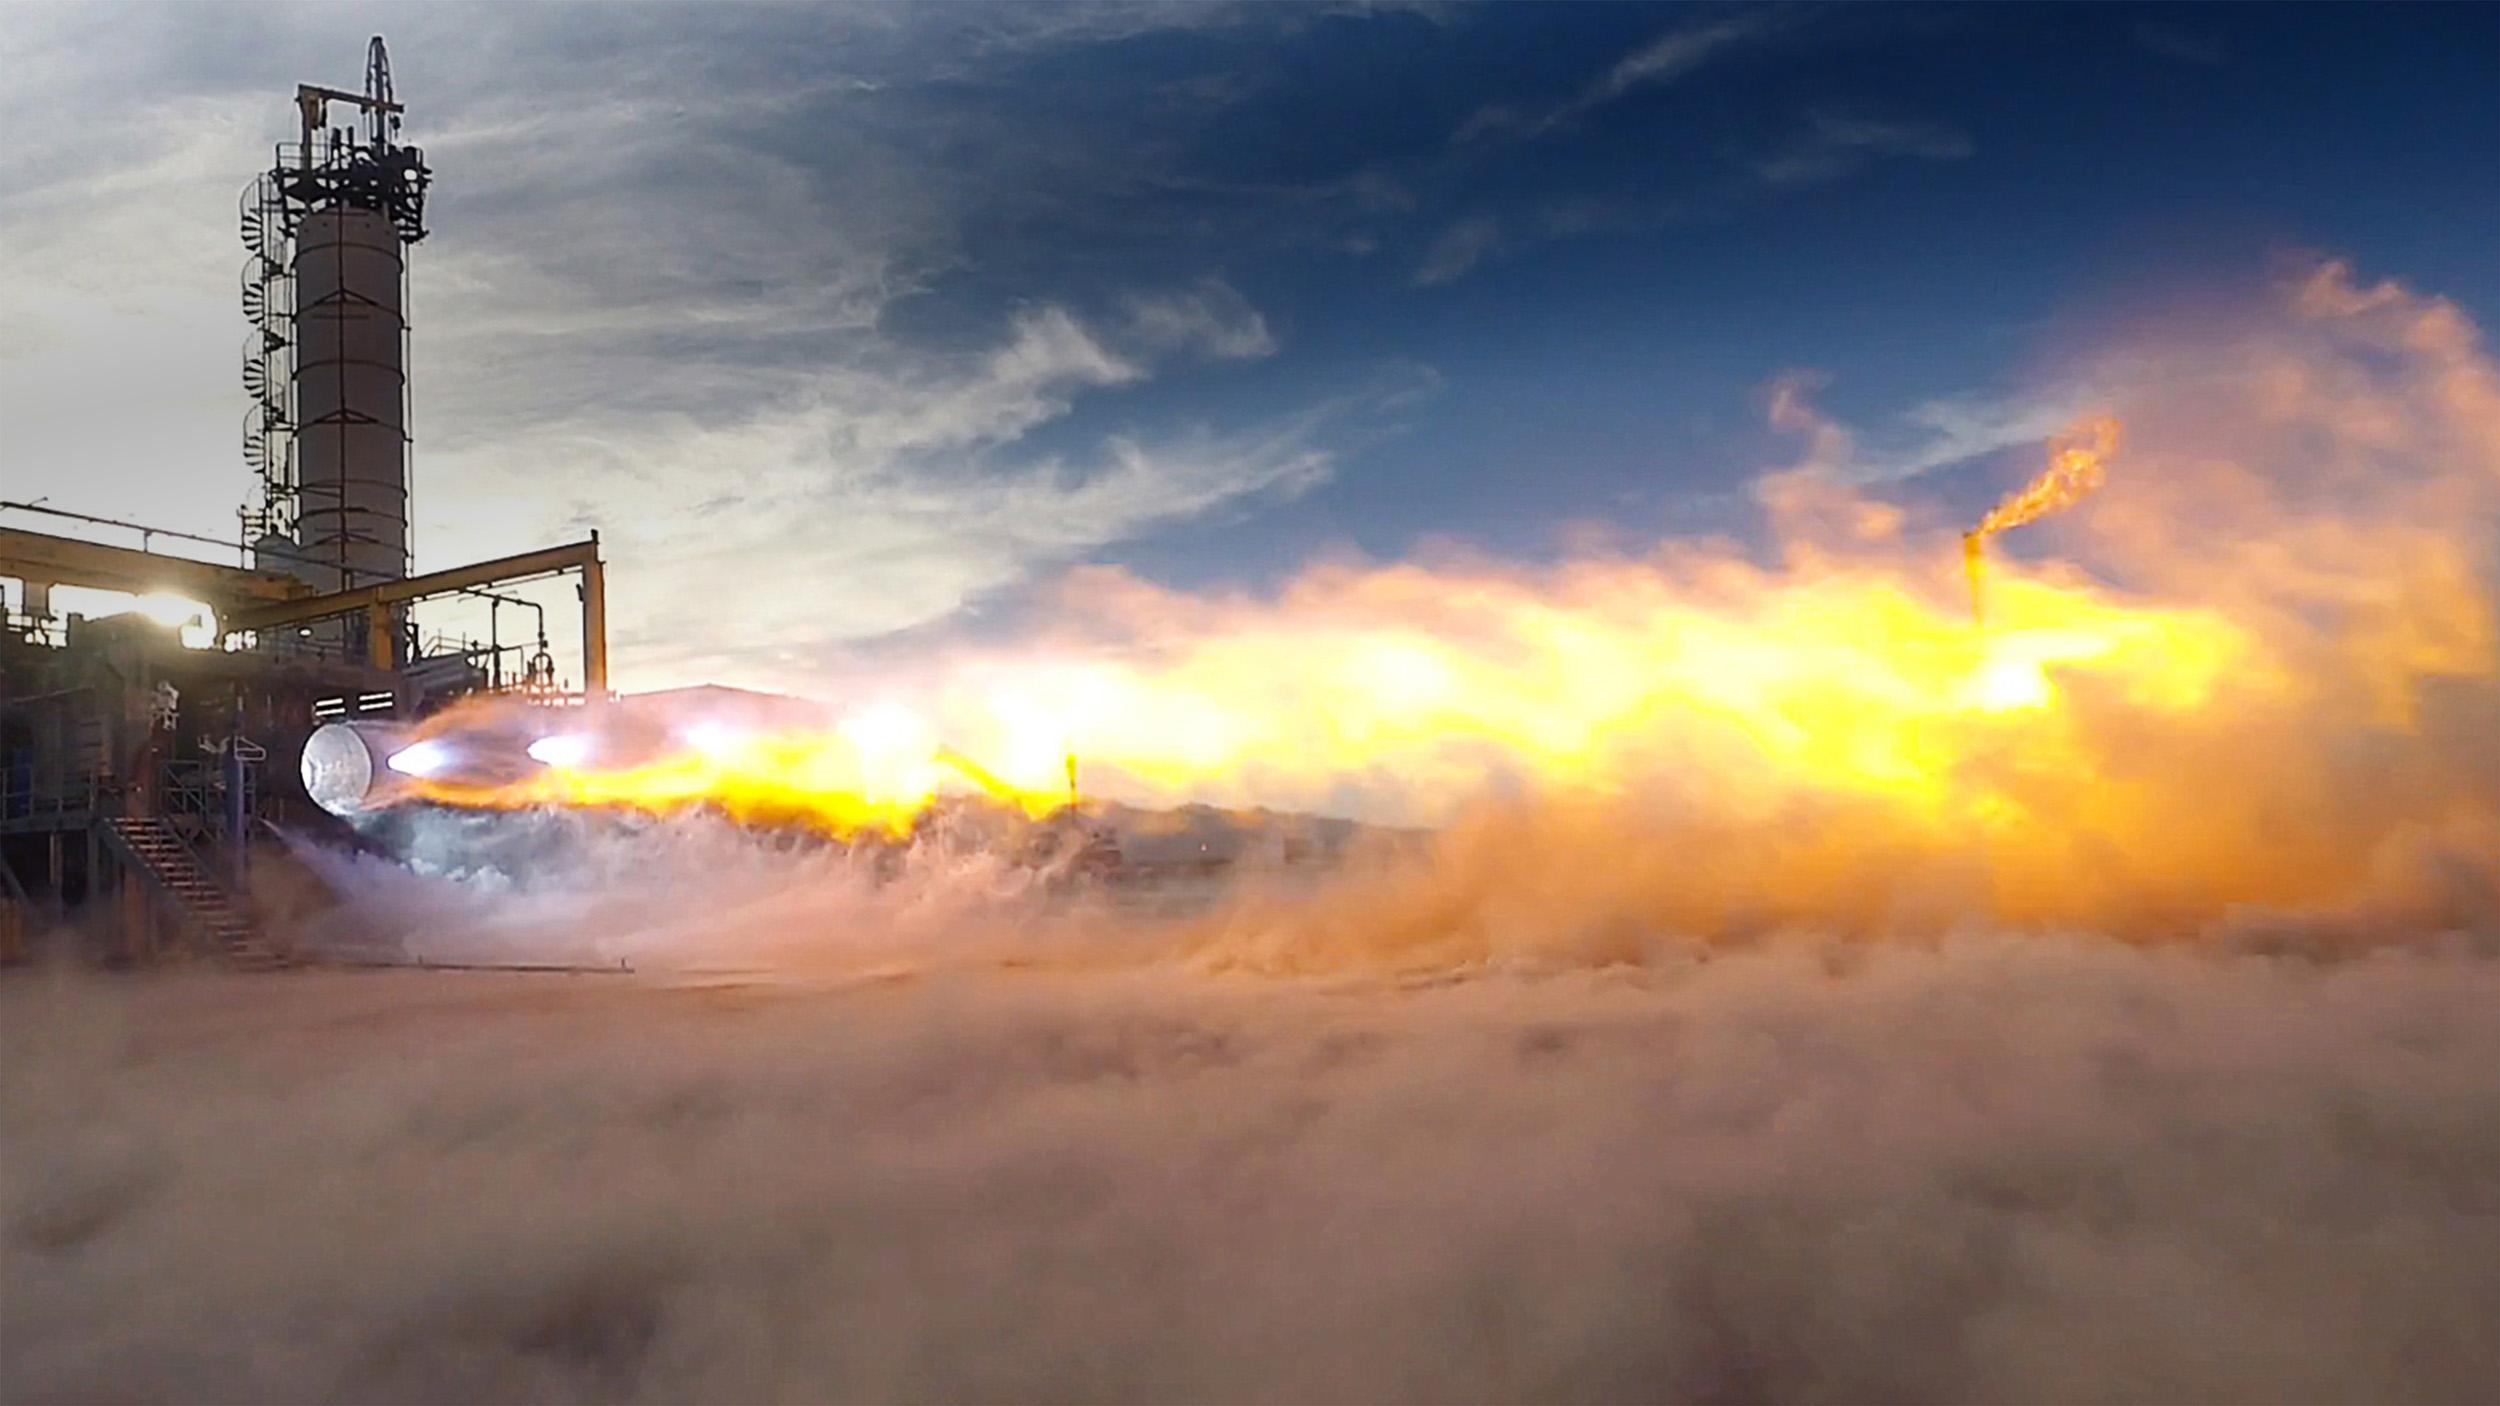 BE-4 engine test firing horizontally